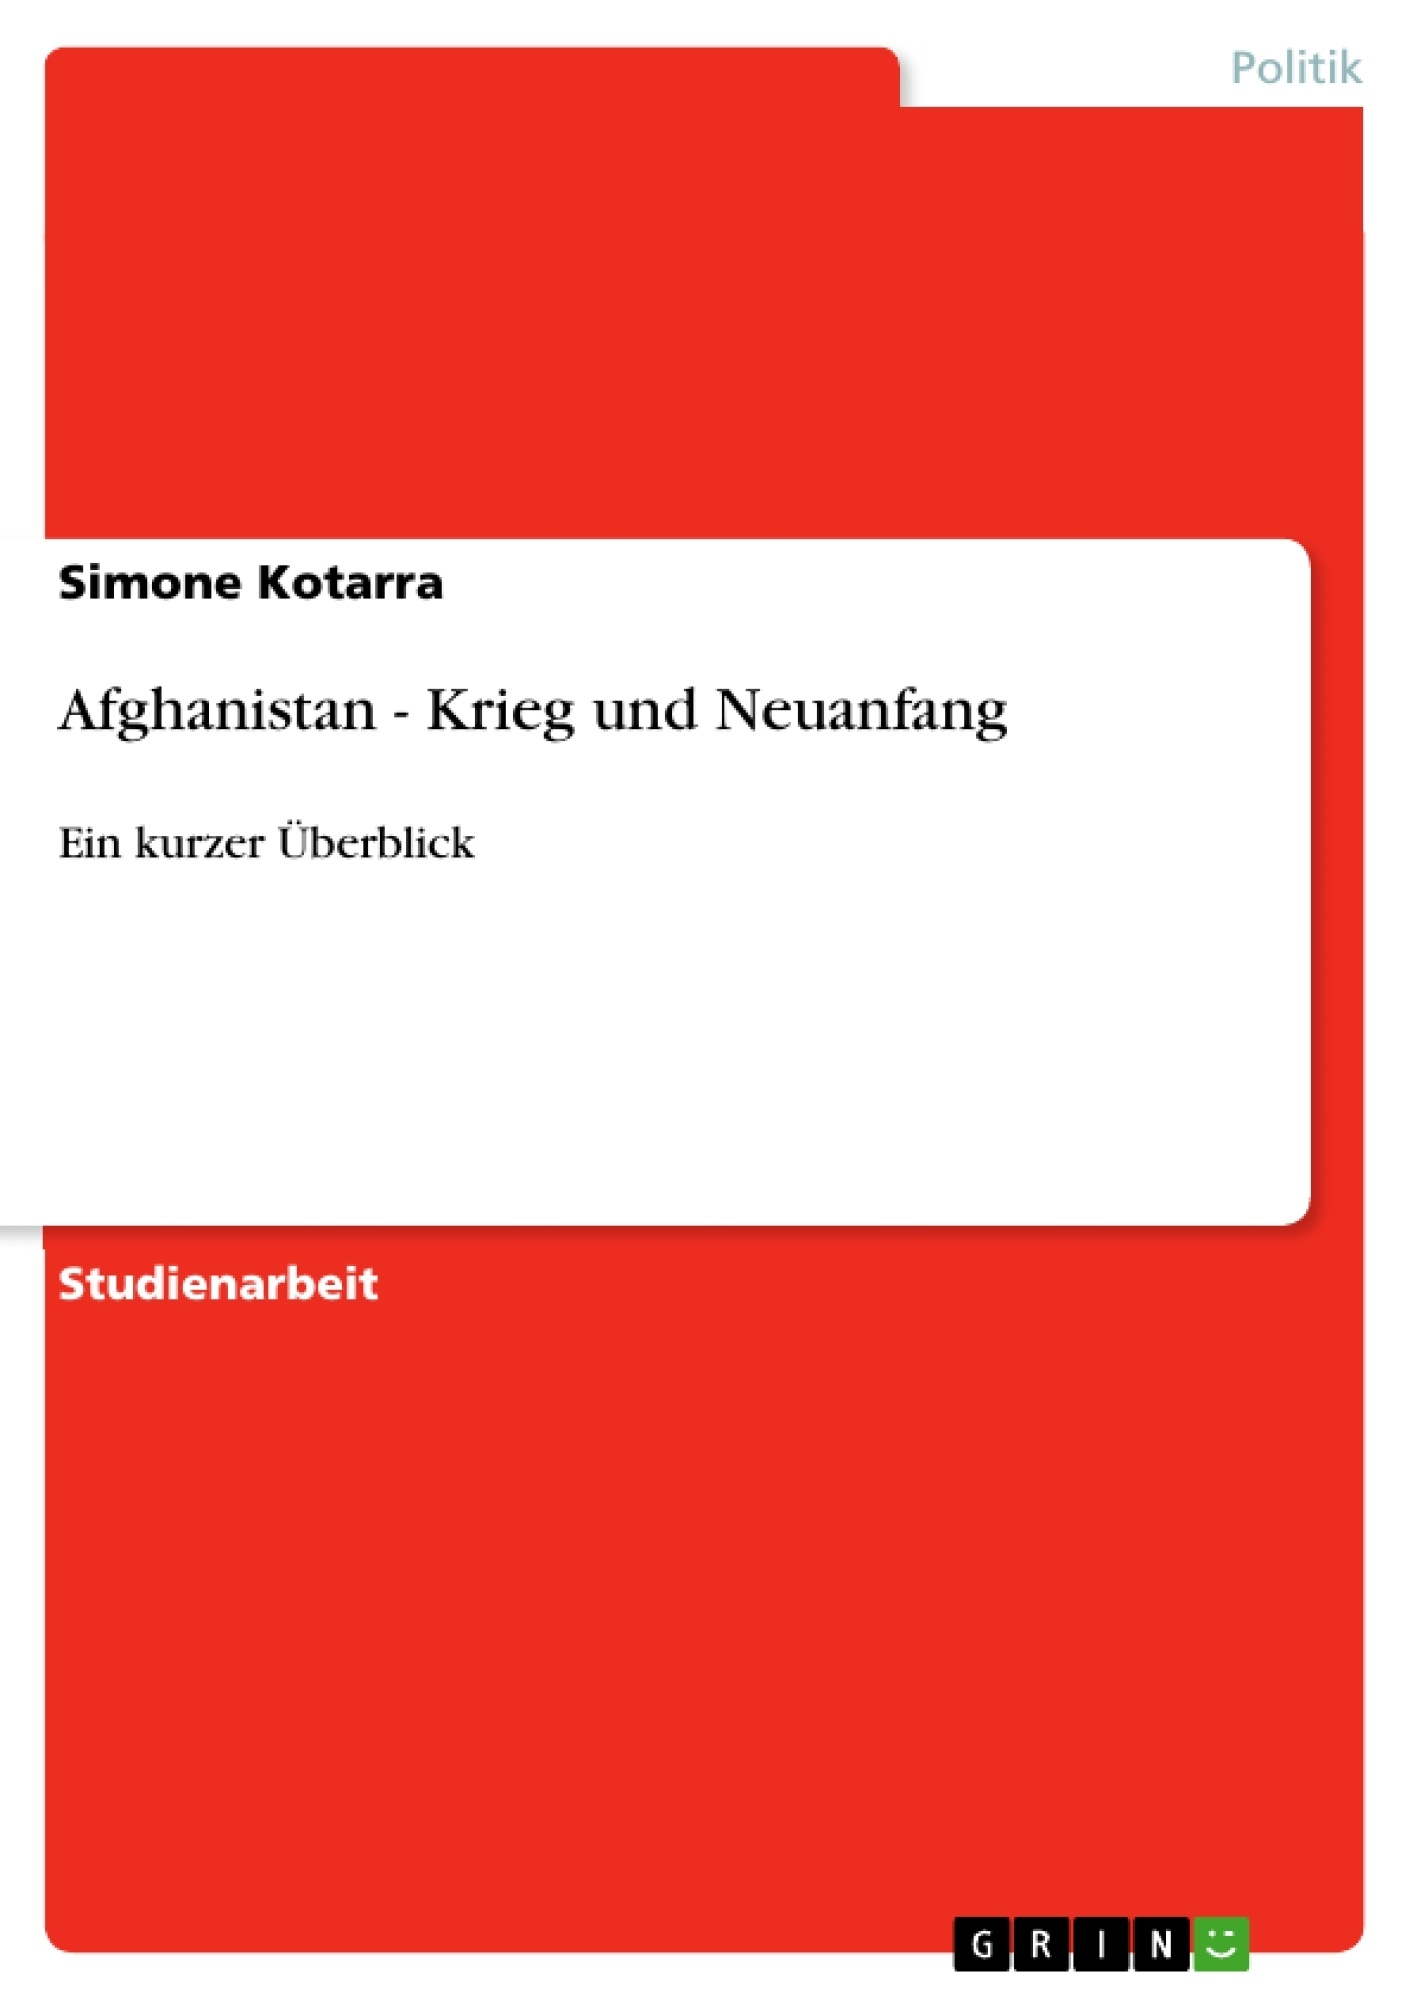 Titel: Afghanistan - Krieg und Neuanfang